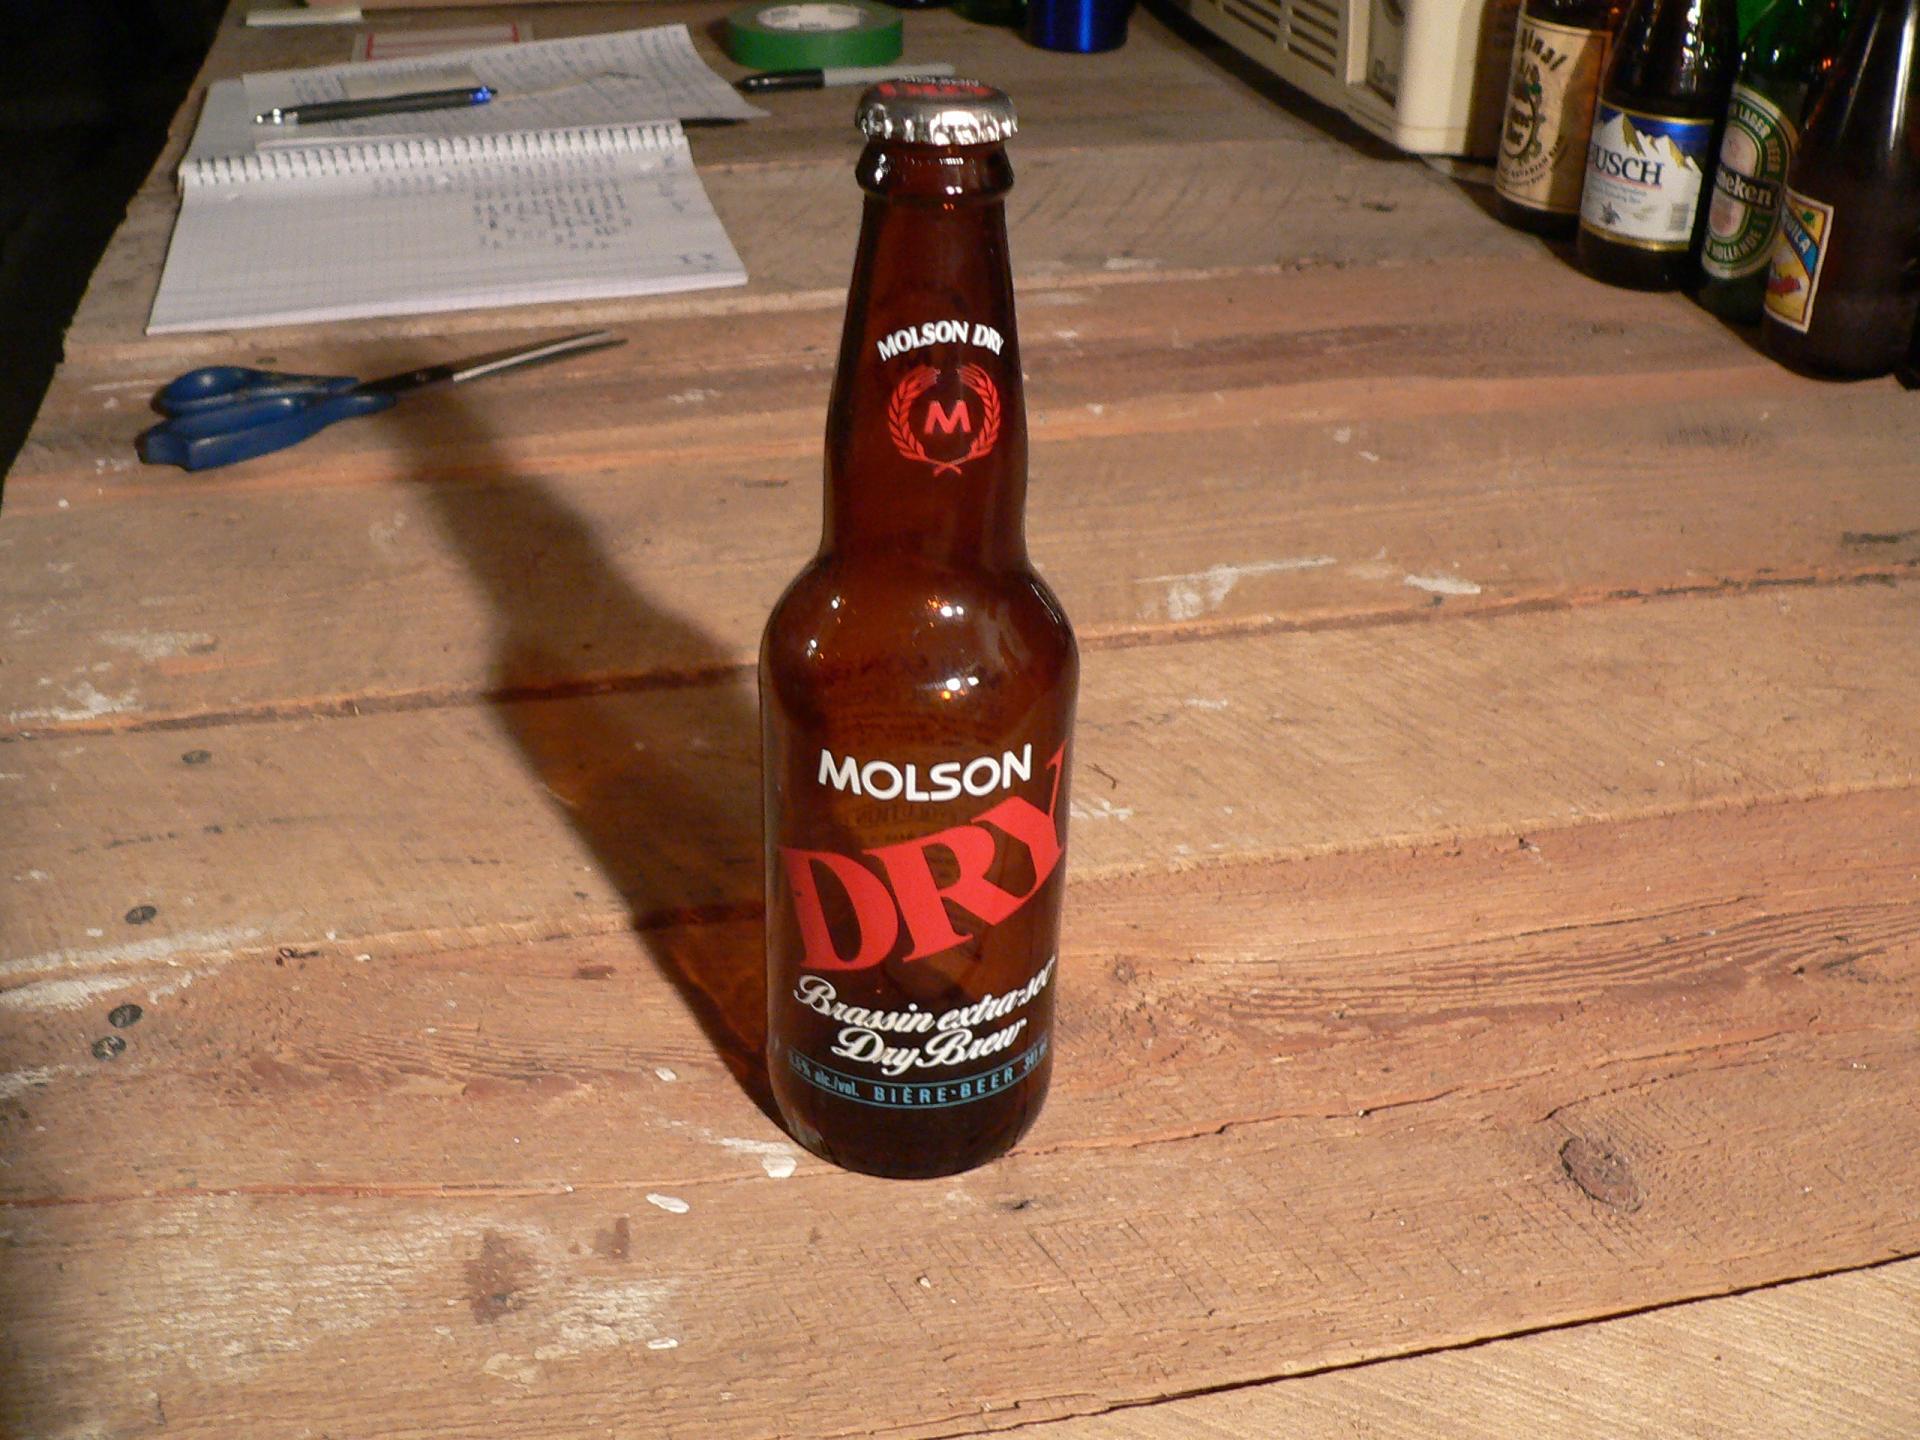 Biere molson dry # 4739.52